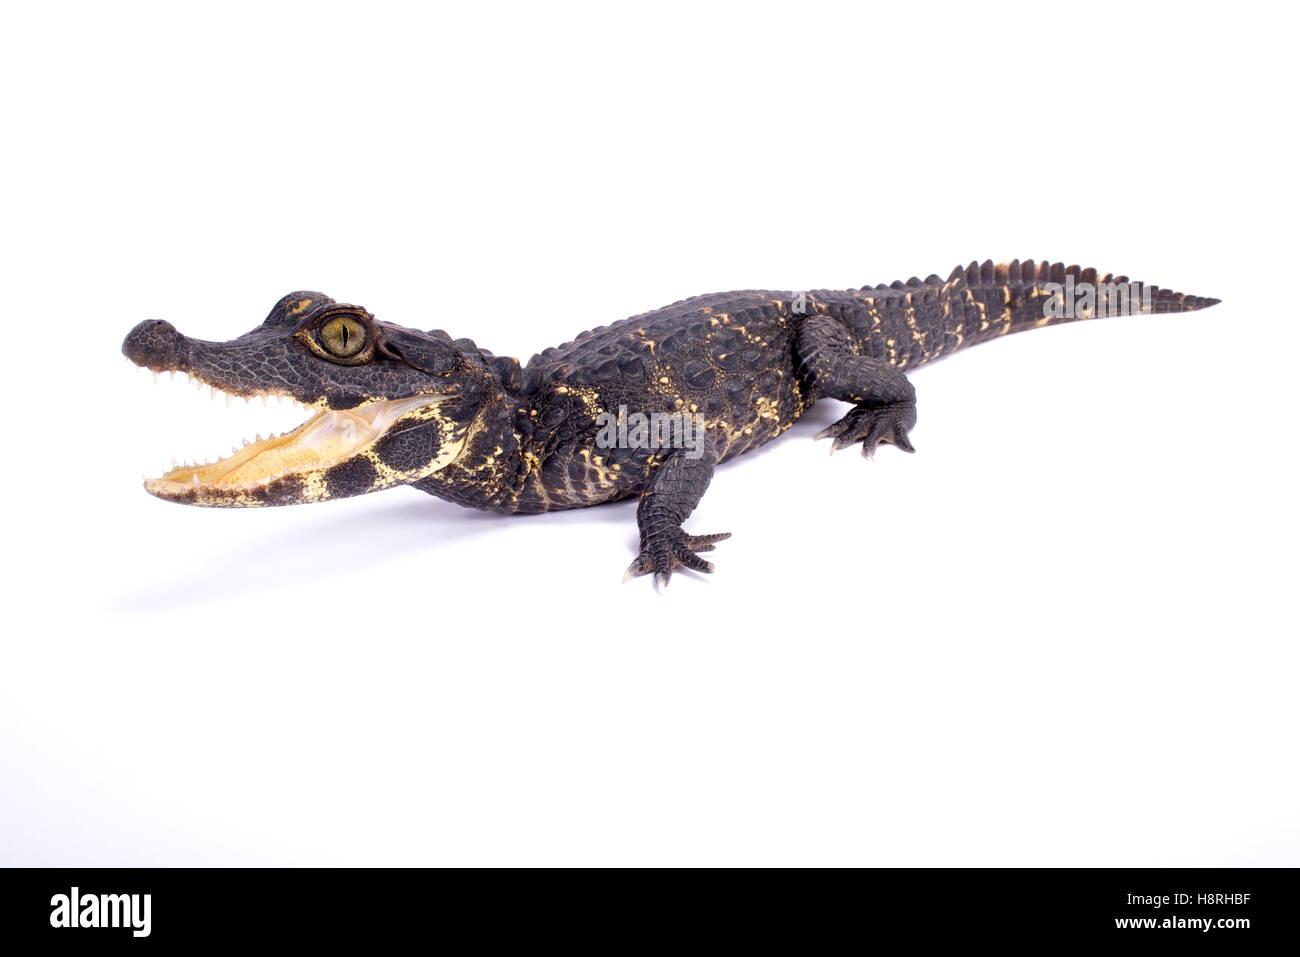 Dwarf crocodile,Osteolaemus tetraspis - Stock Image